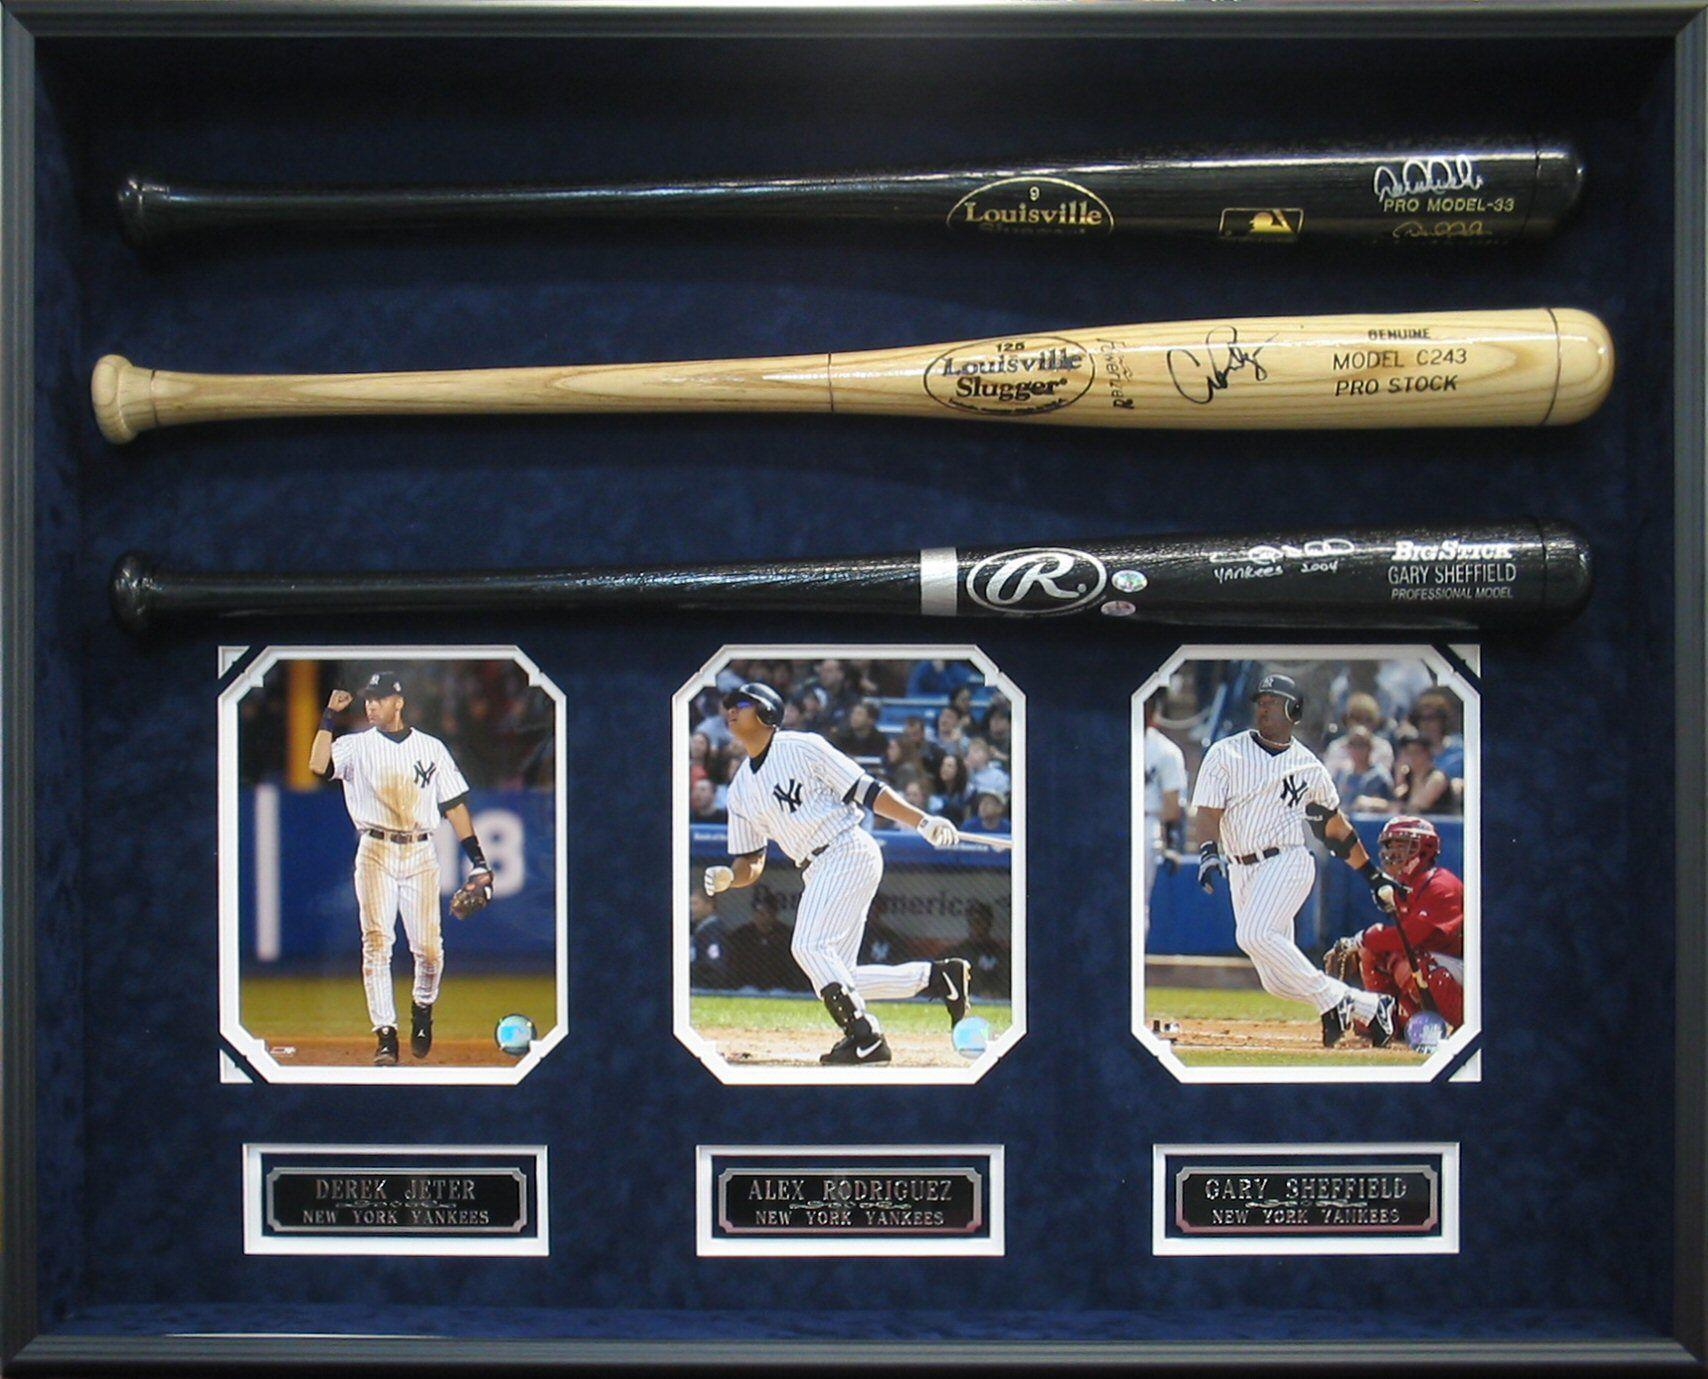 Color sheets derek jeter - Derek Jeter Alex Rodriguez And Gary Sheffield Autographed Baseball Shadowbox Yankees Mlb